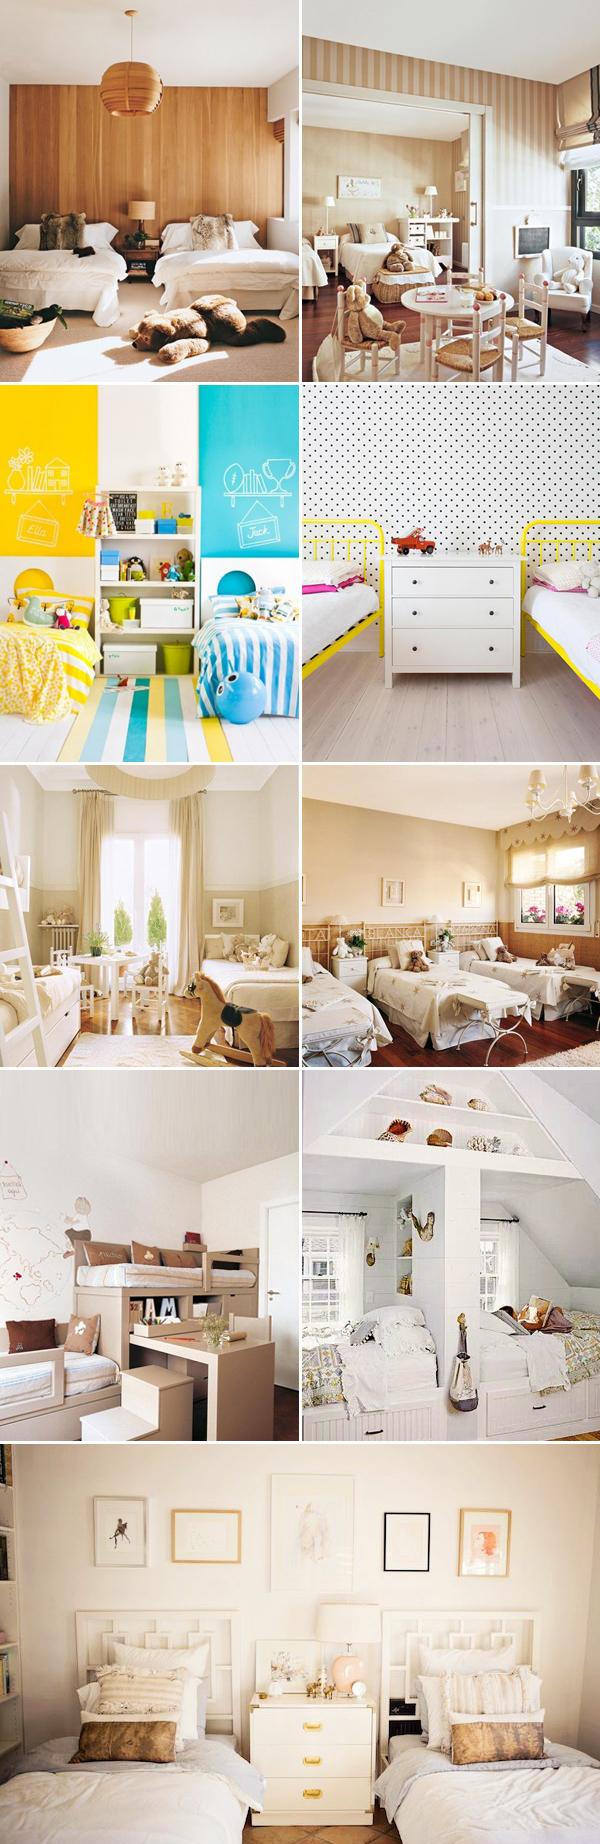 shared-room03-modern